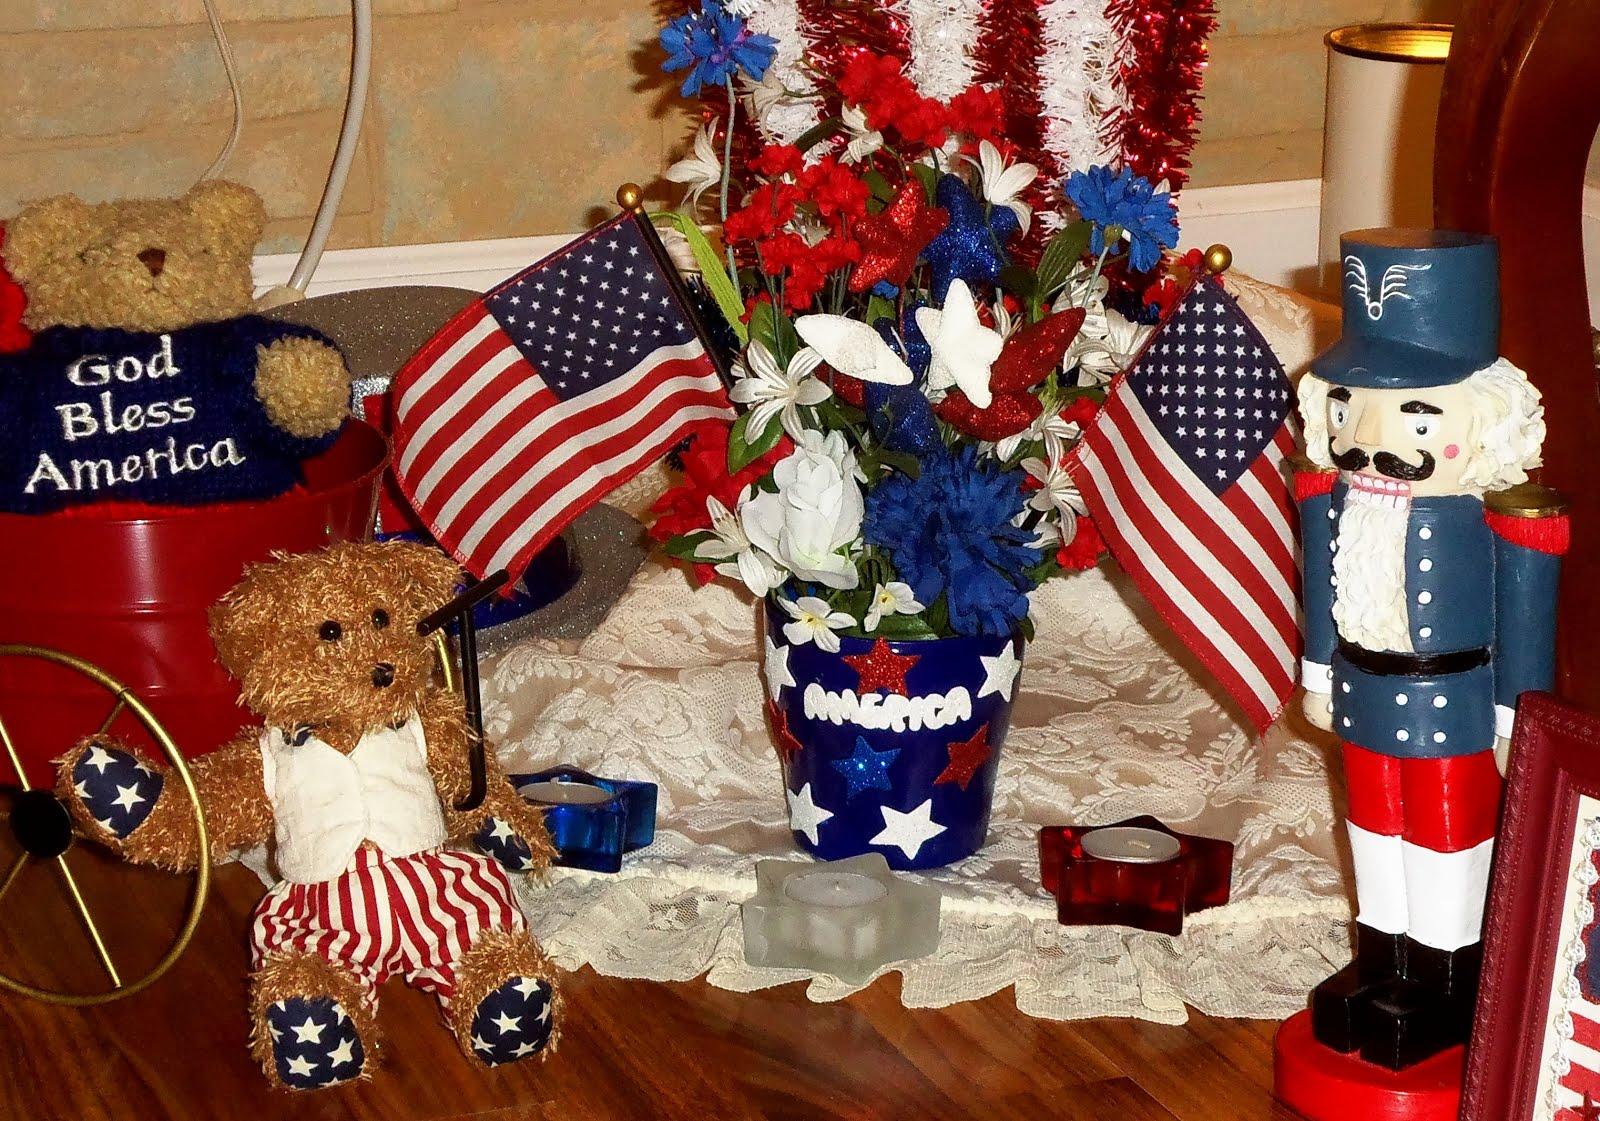 Summer Patriotic Decor 2015, Part 3